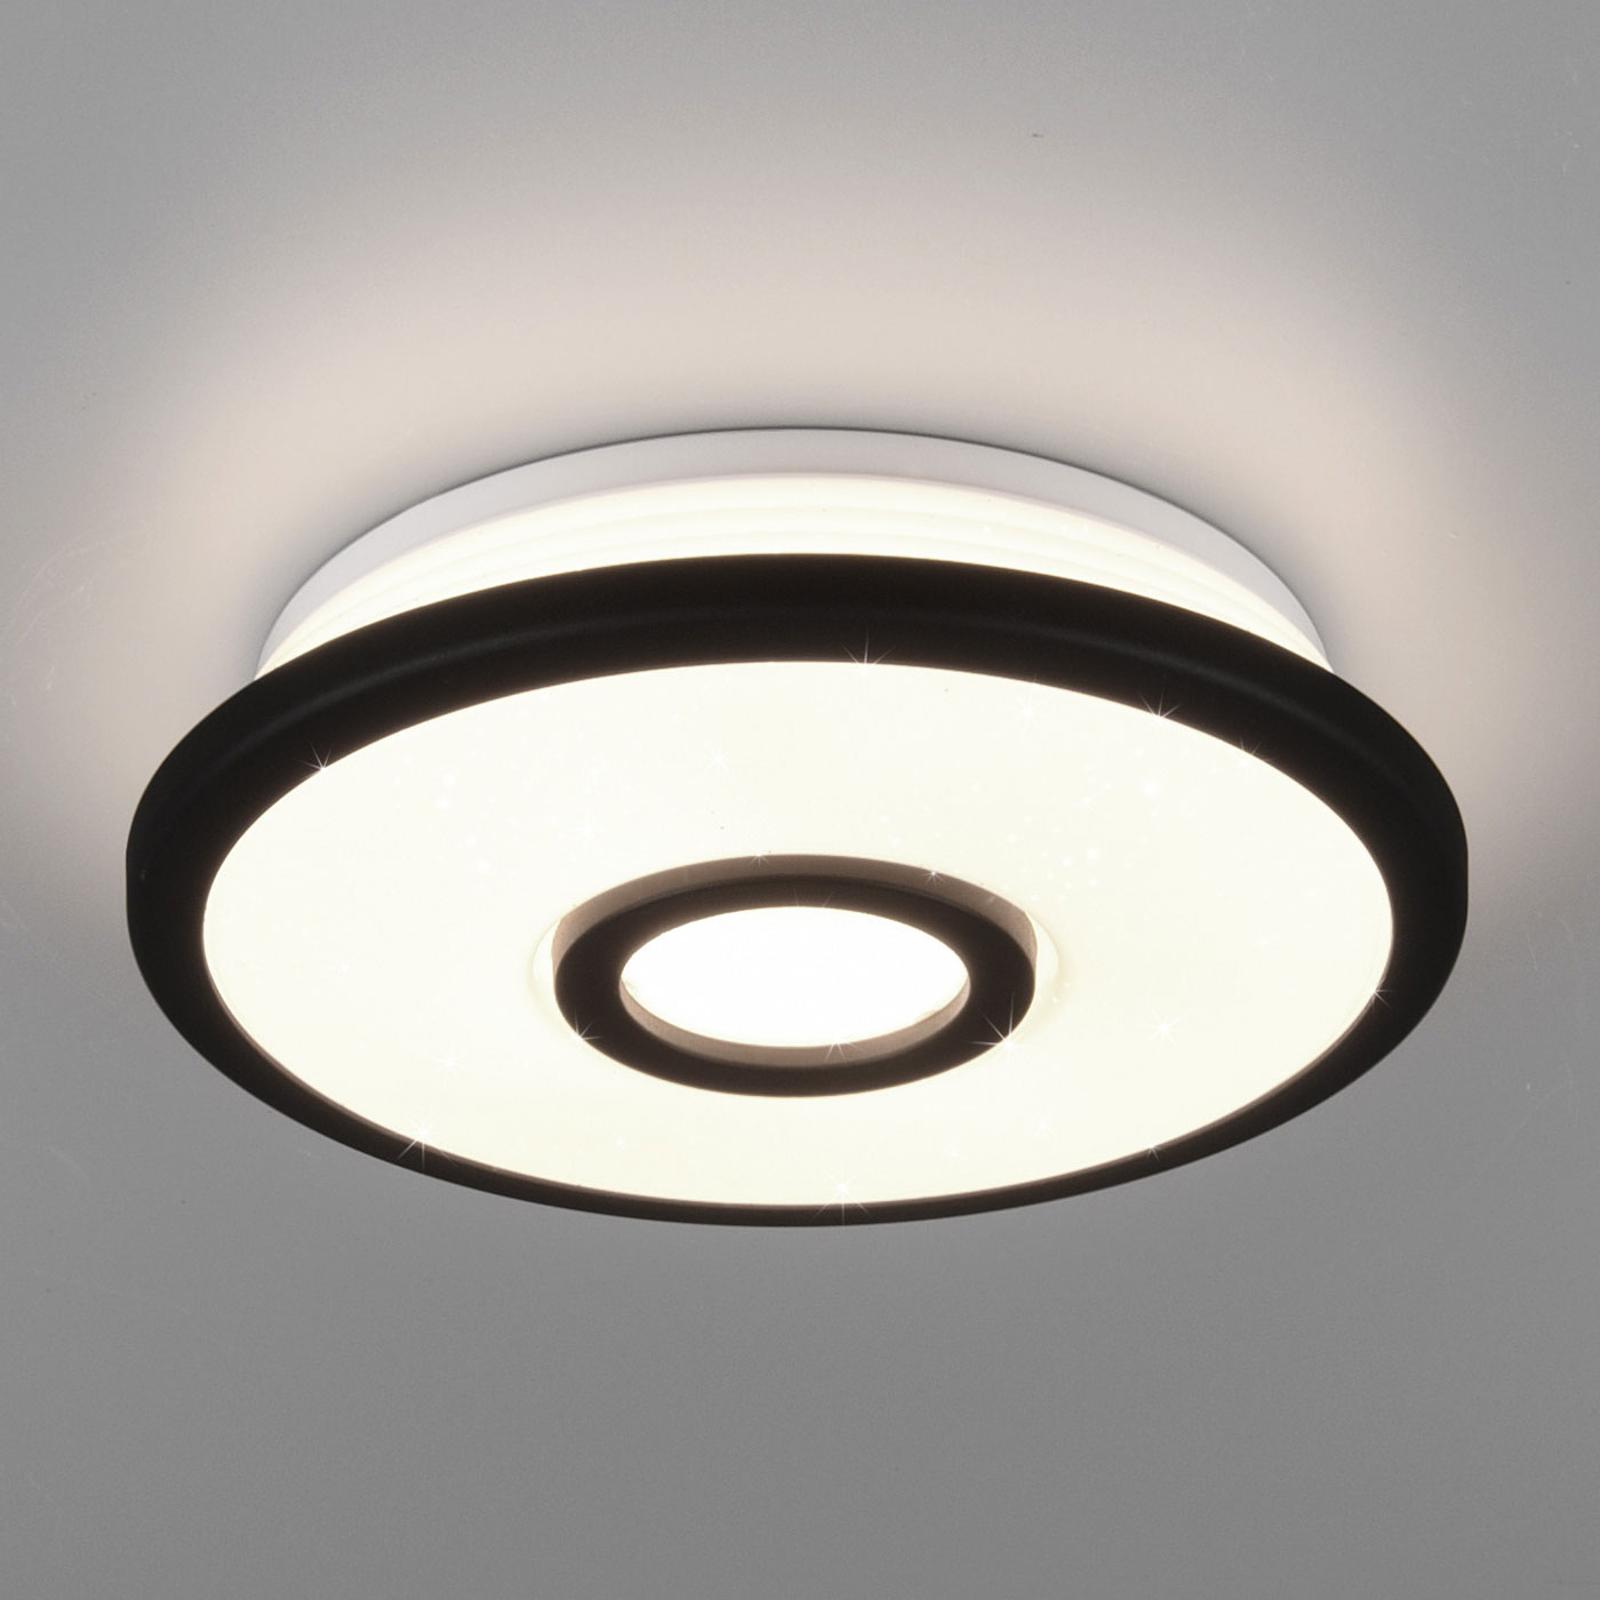 LED plafondlamp Okinawa, Starlight-effect, Ø 21 cm